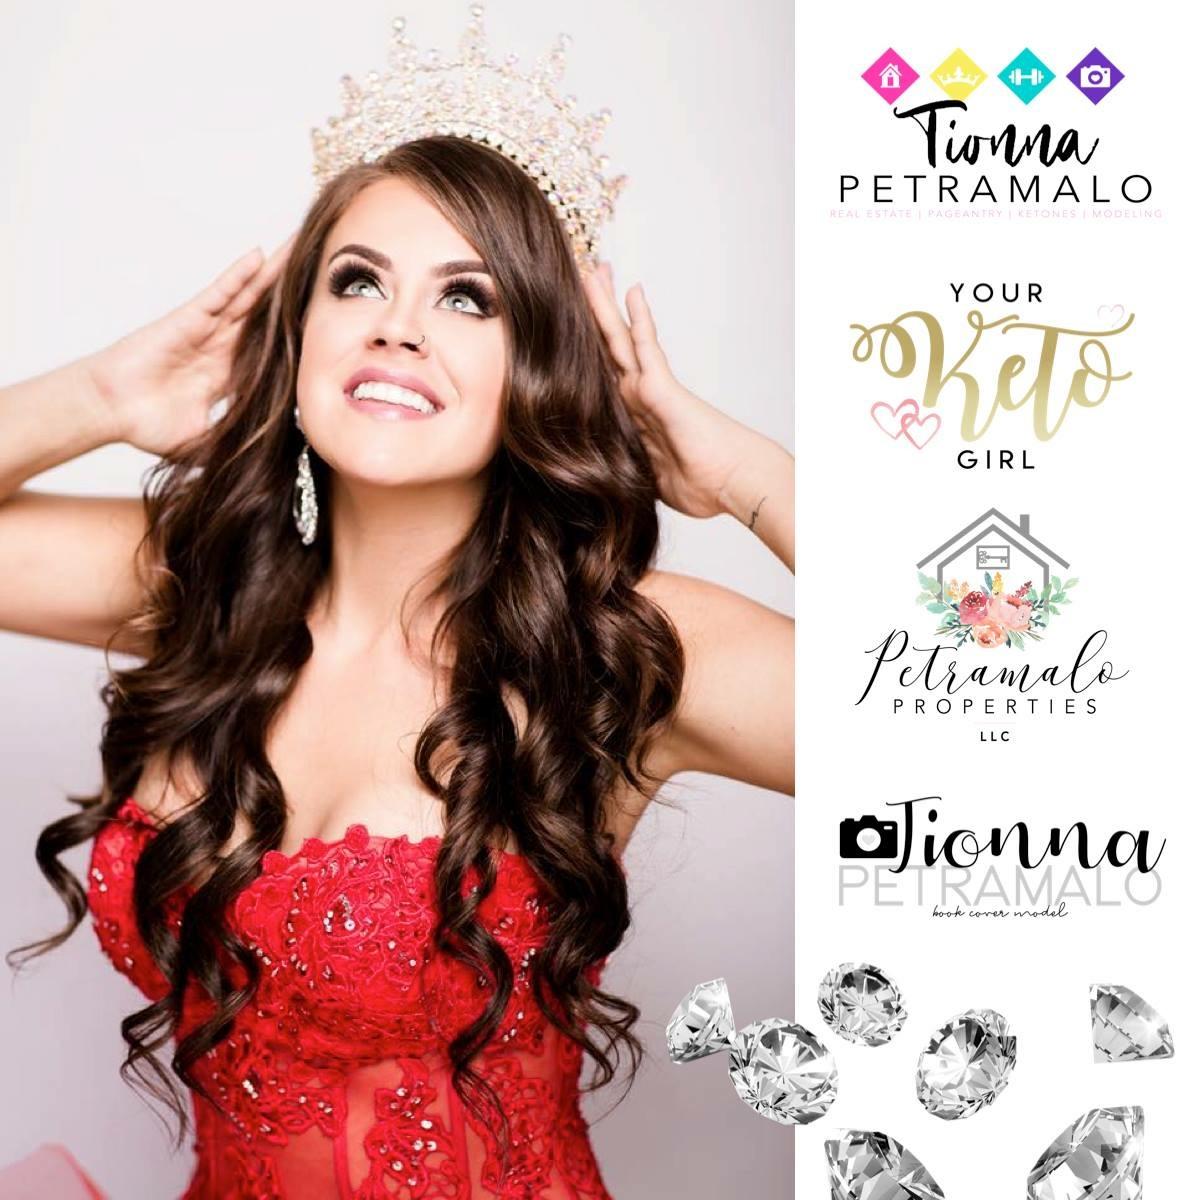 Official hair sponsor of Tionna Petramalo International Ms. USA 2018  @tionnapetramalo